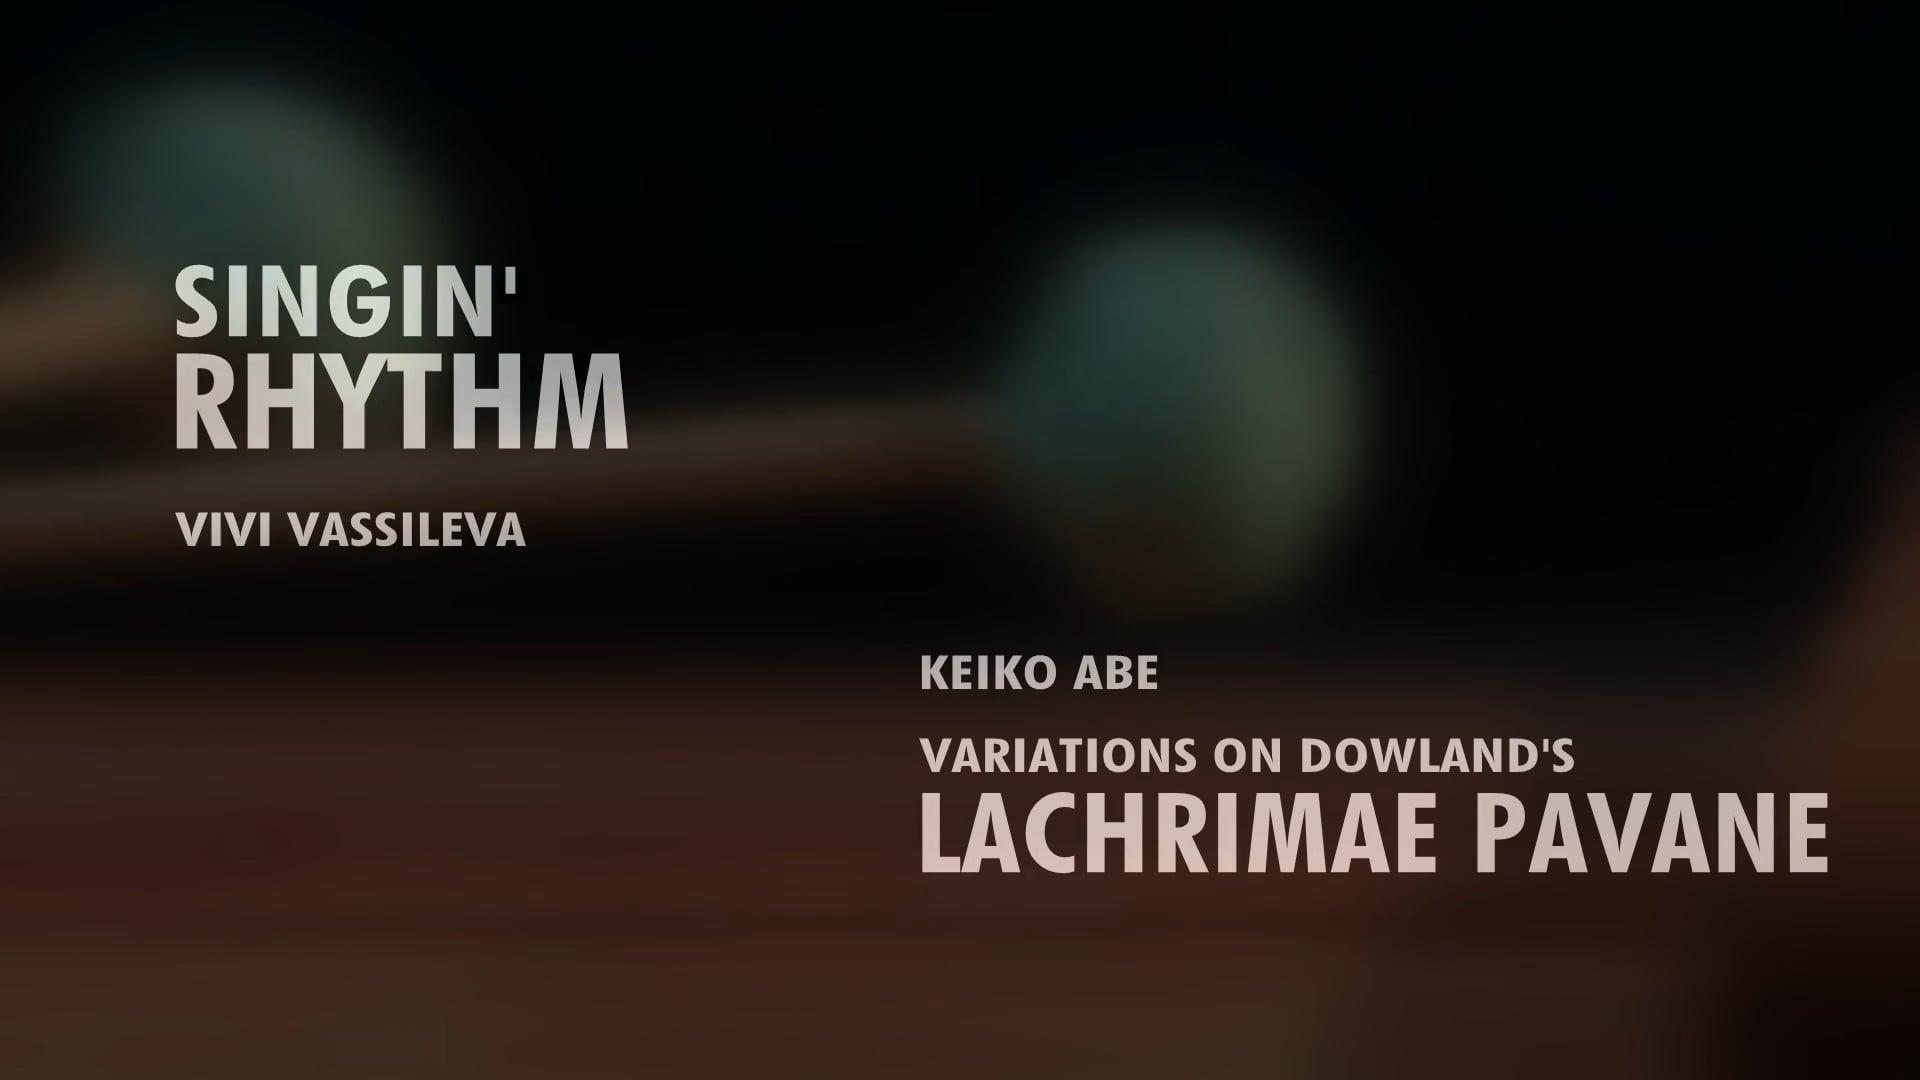 EPK Vivi Vassileva Lachrimae Pavane